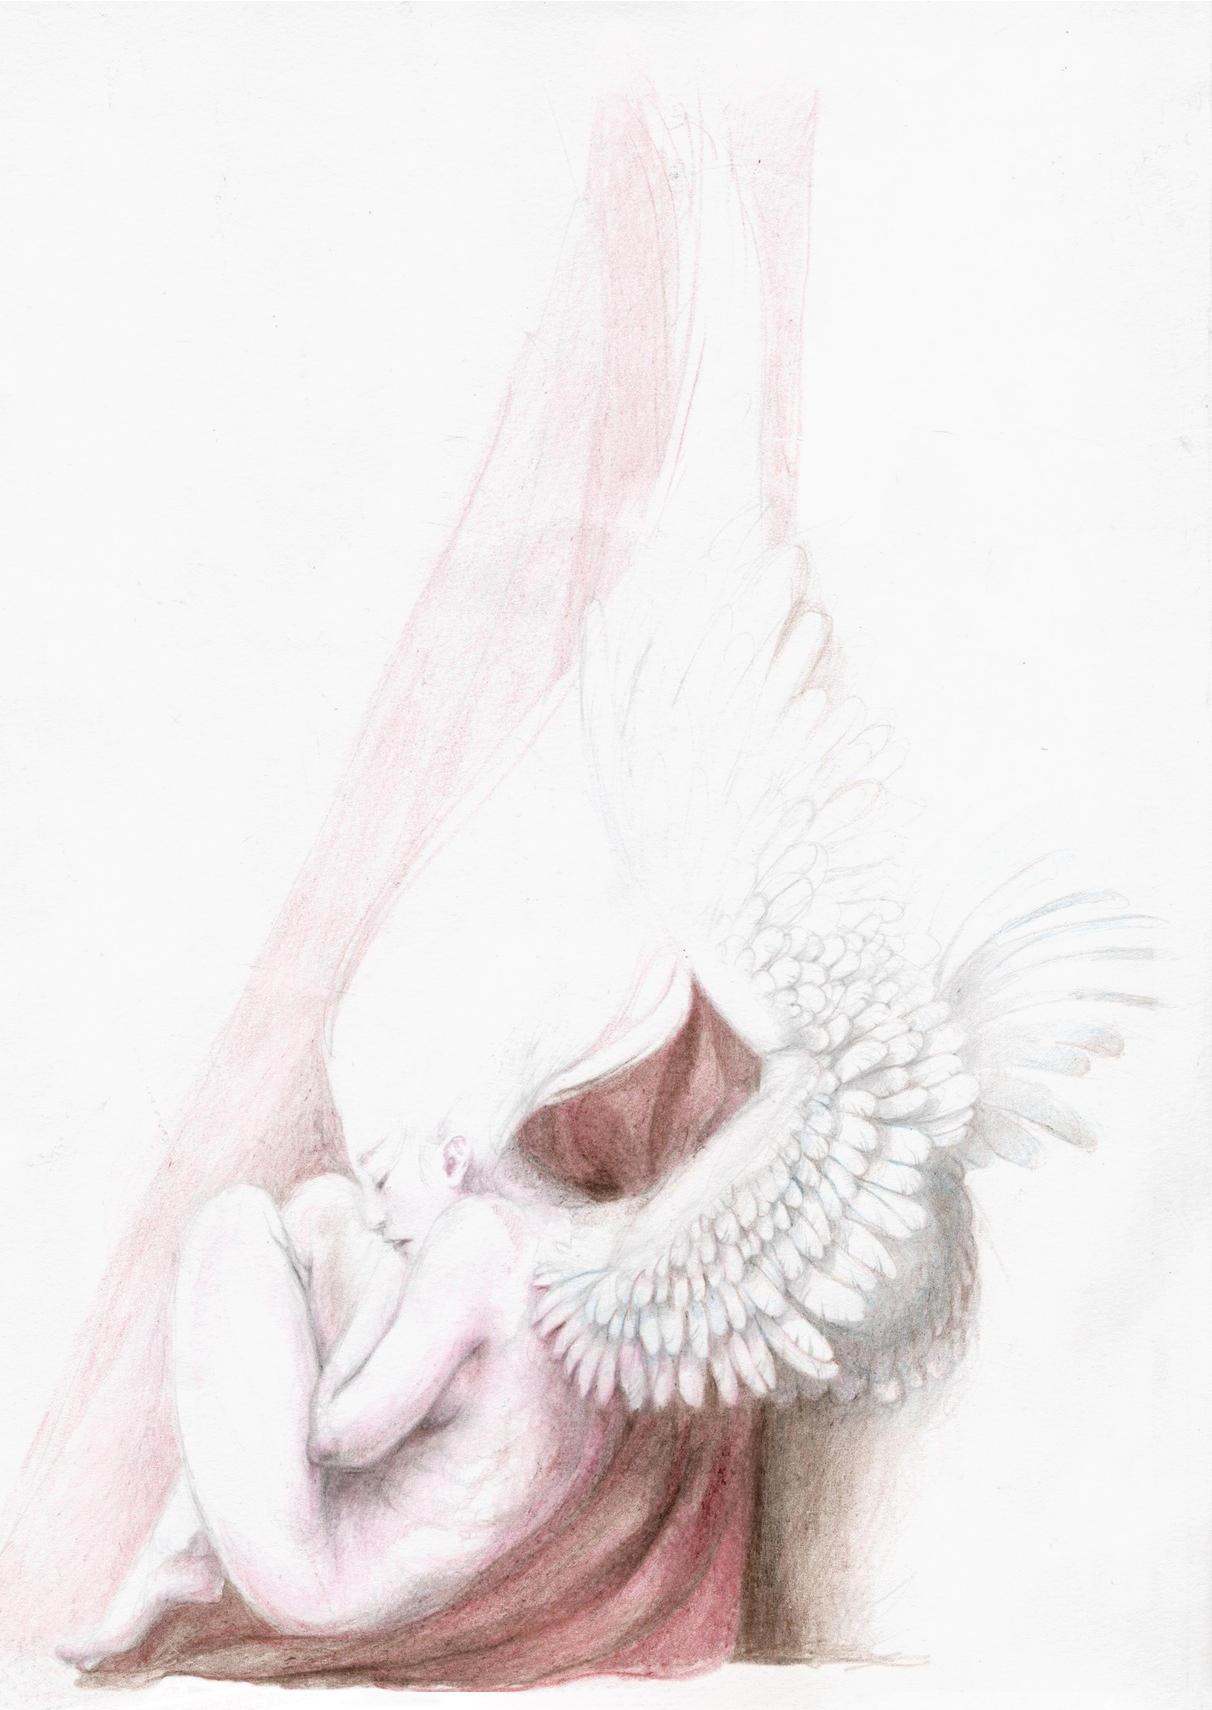 Sleeping Angel by MikhailD